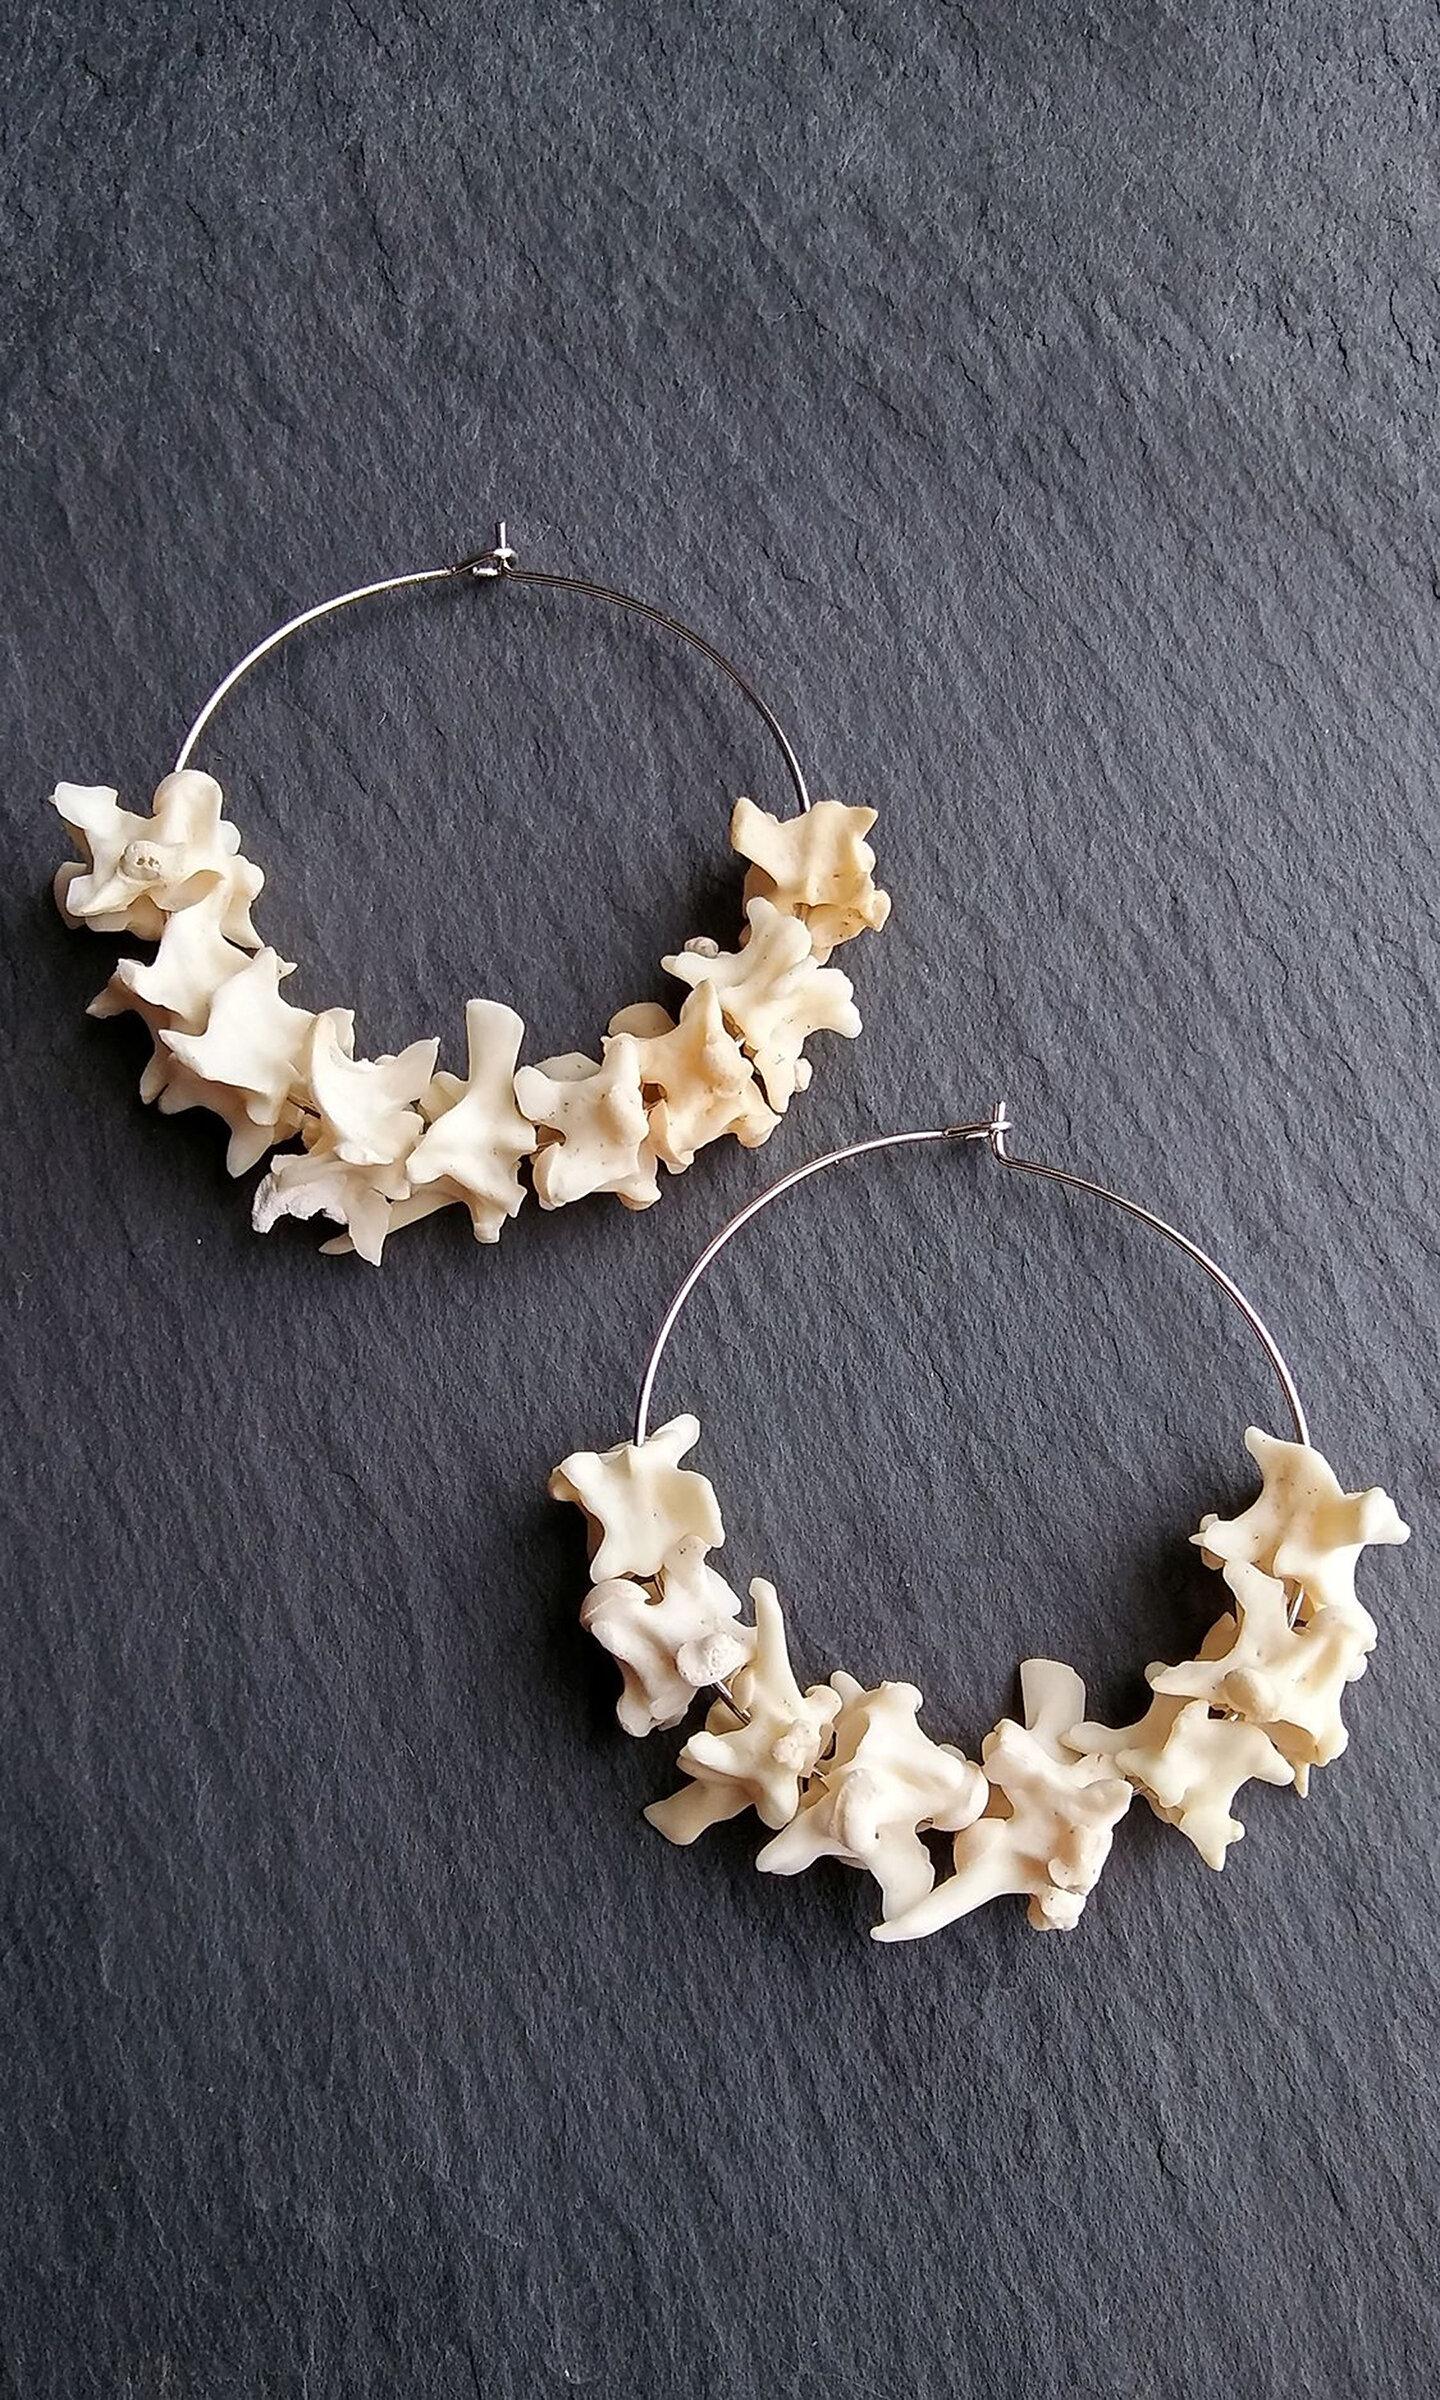 Gertie's Attic Jewelry